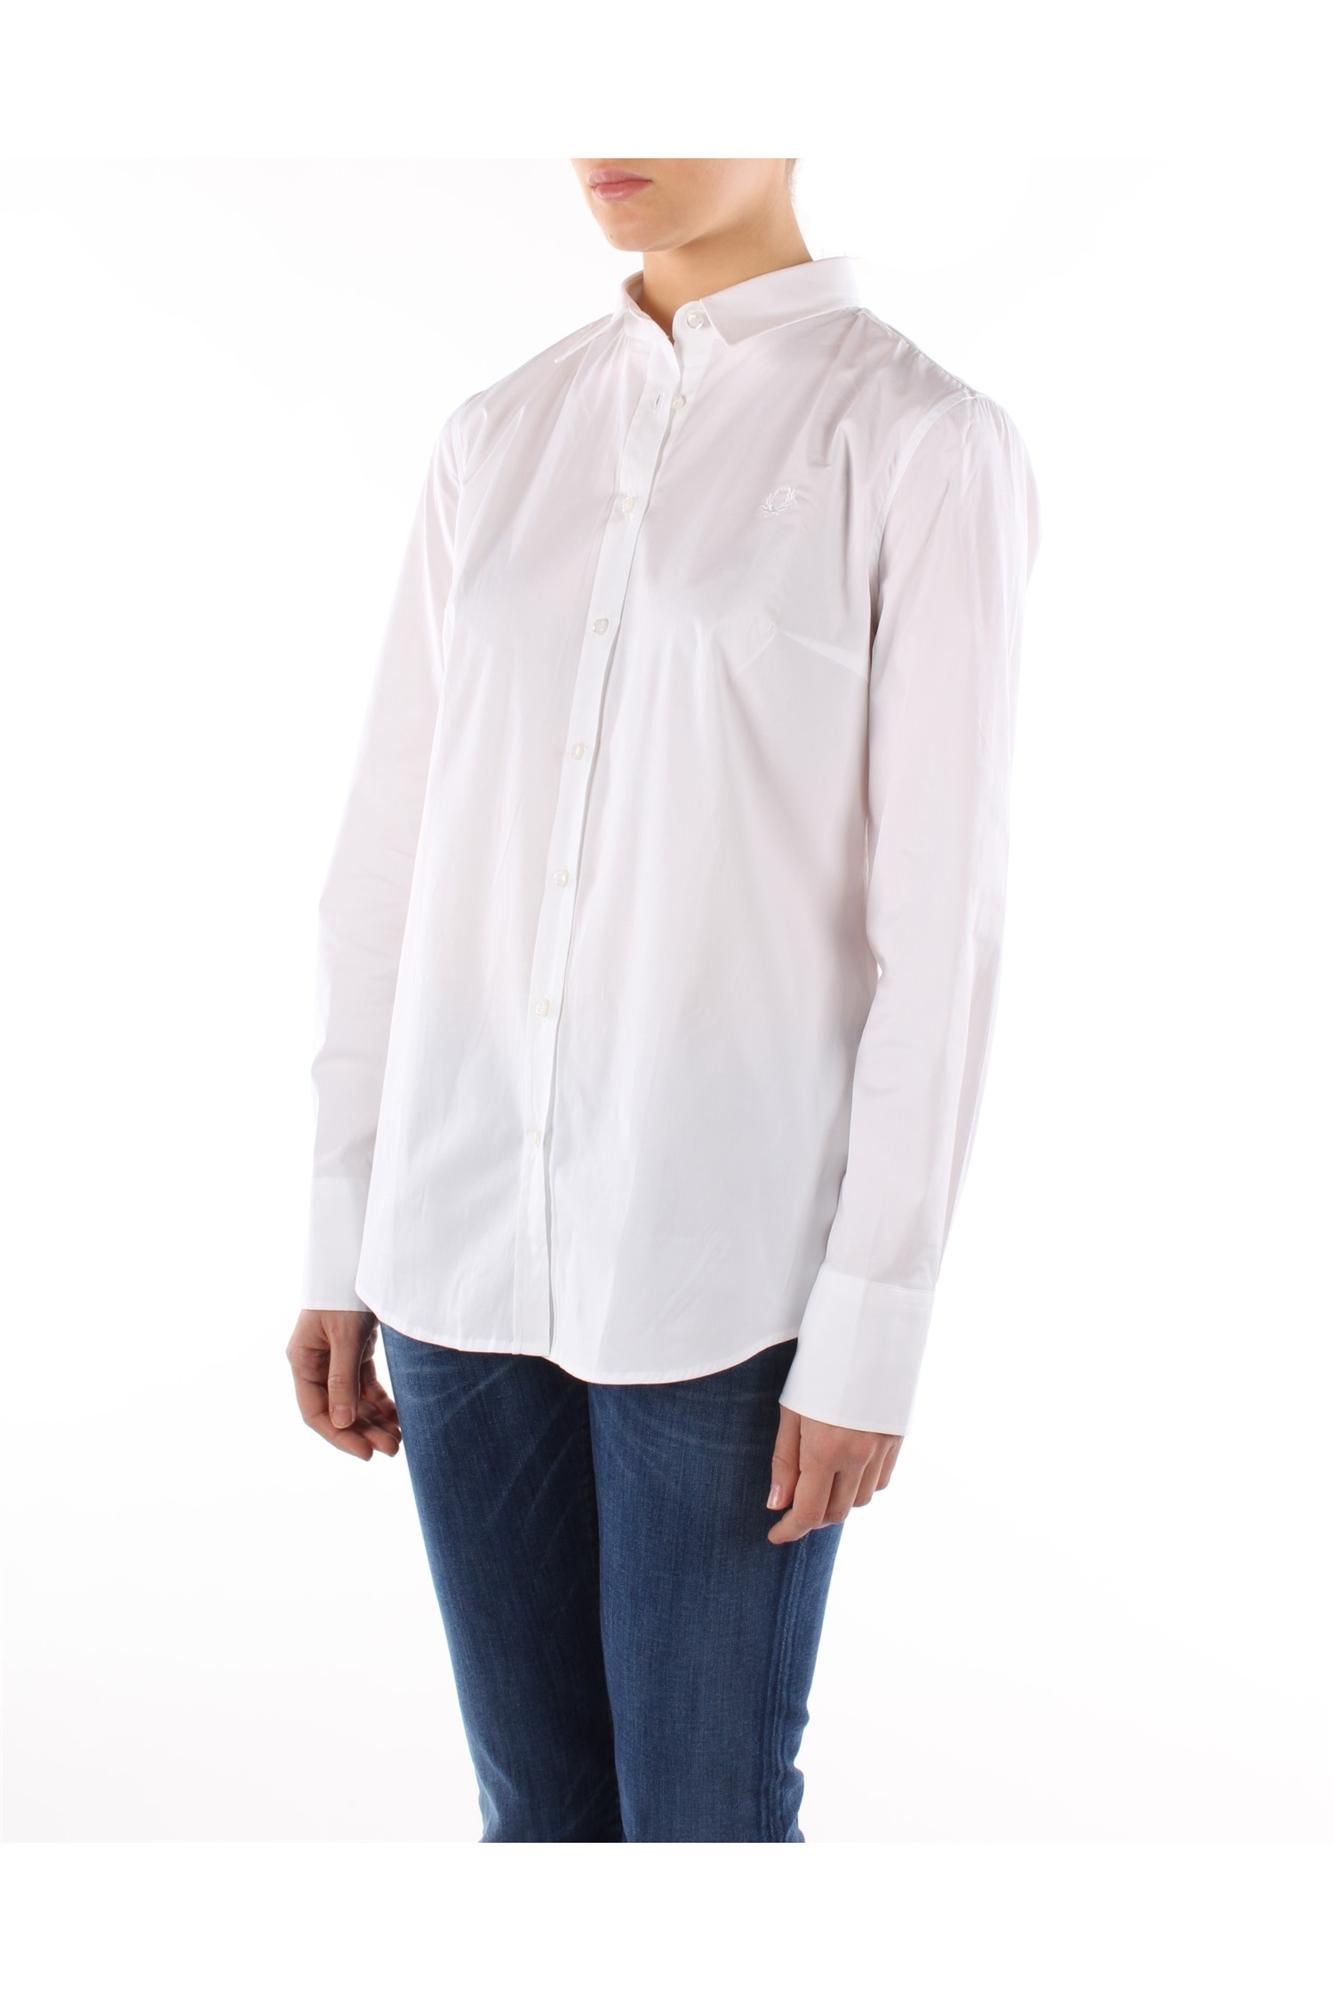 Shirts Fred Perry Women Cotton White 312023009100 | eBay